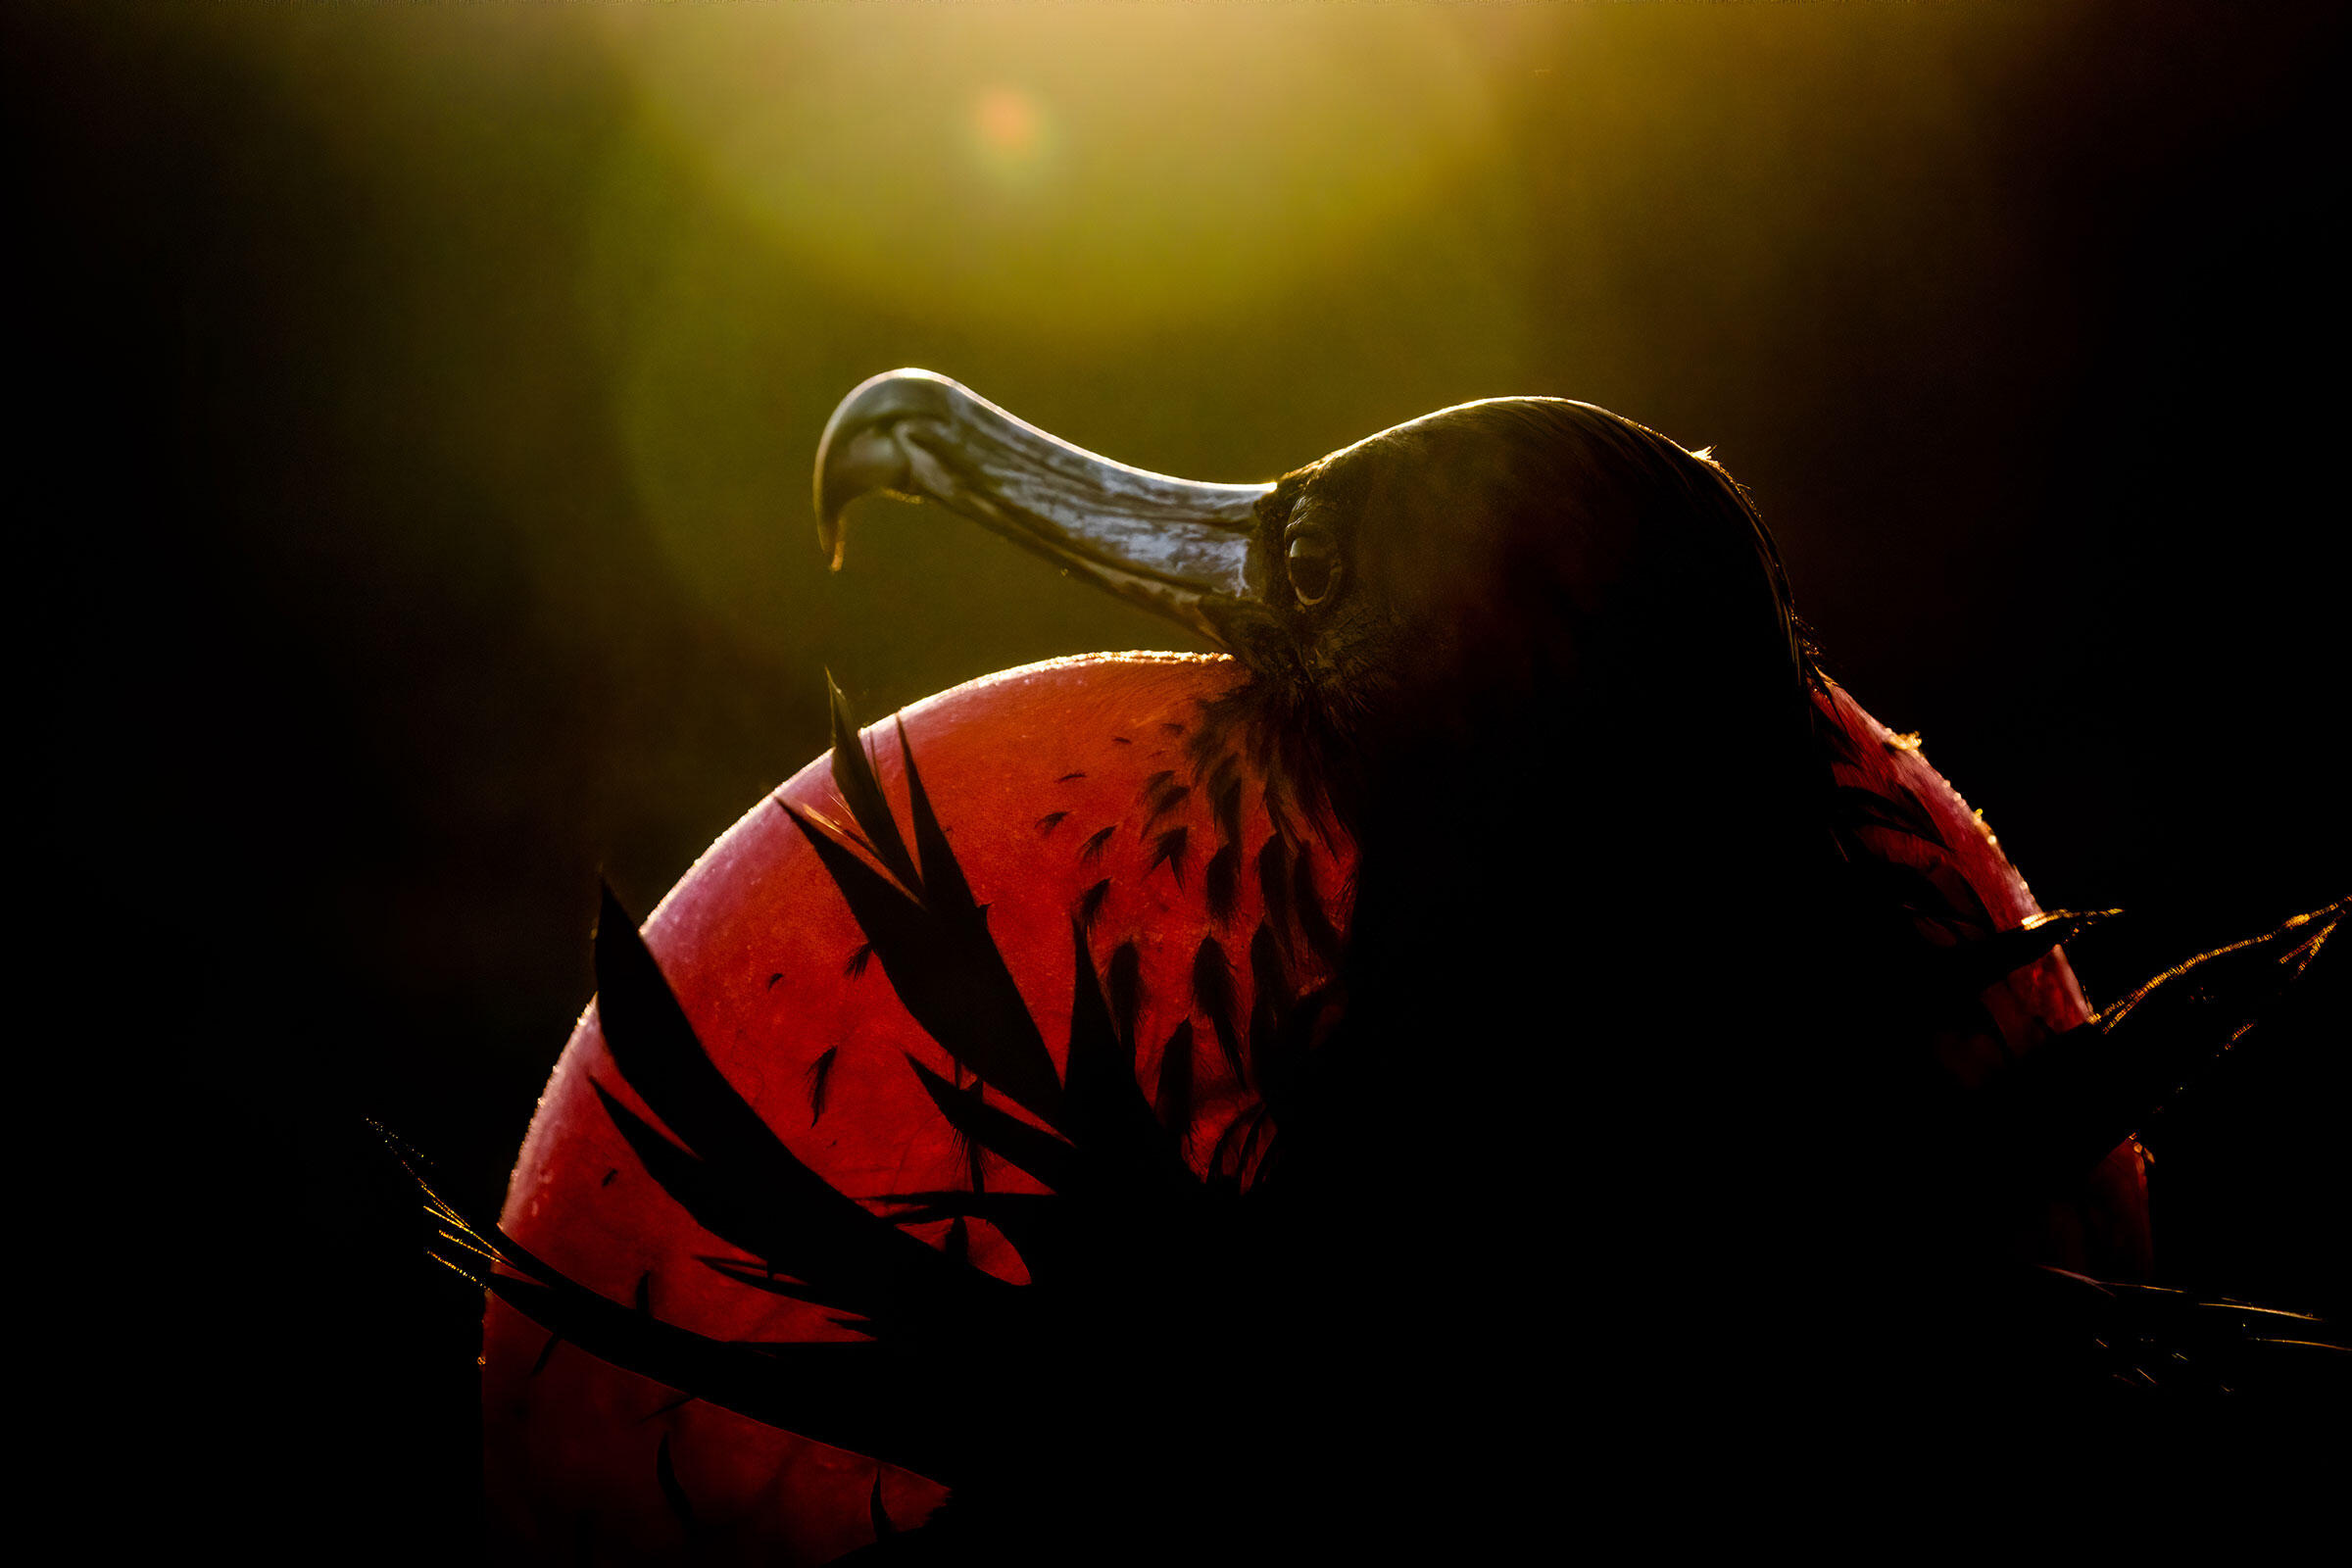 Magnificent Frigatebird, captured by 2020 winner Sue Dougherty.